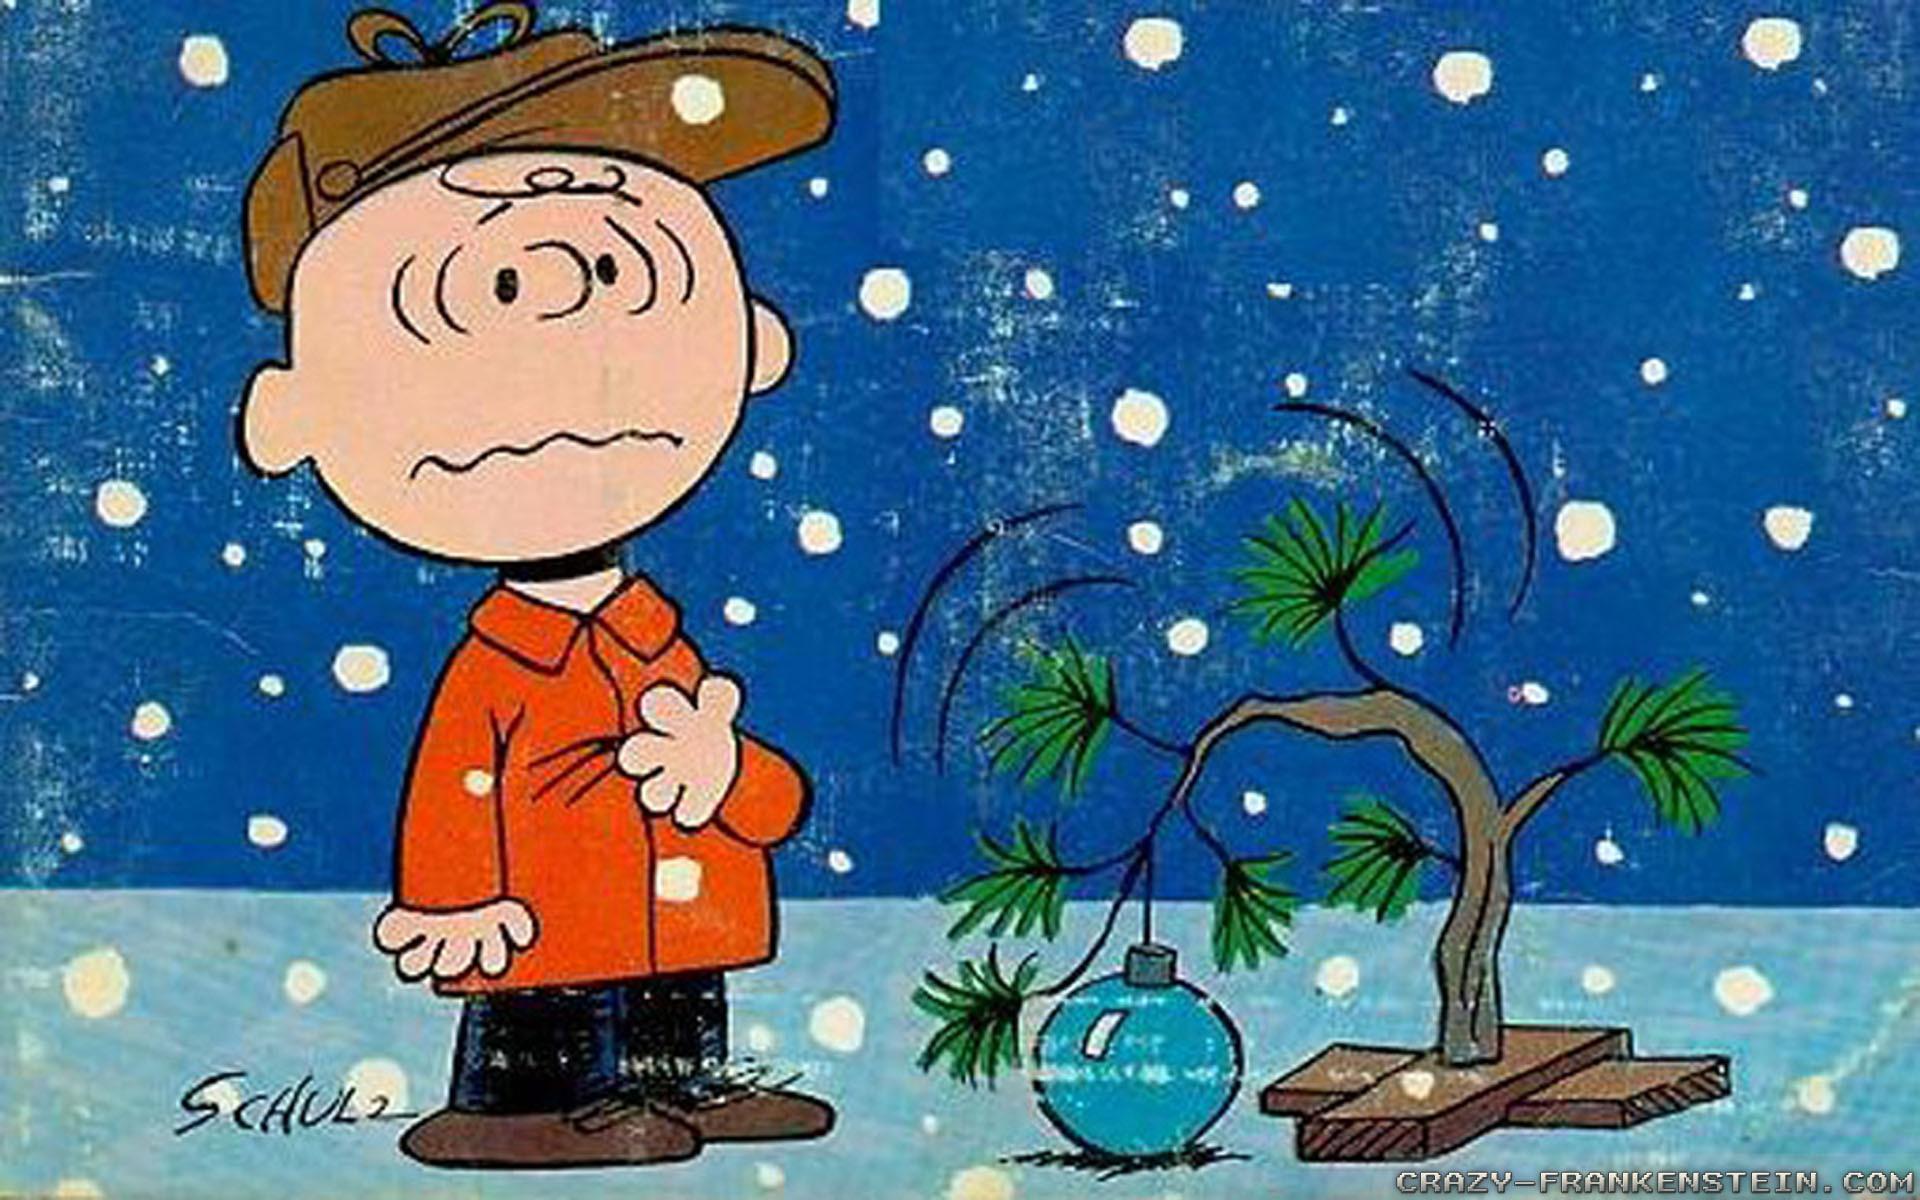 Wallpaper: Charlie Brown Christmas tree cartoon. Resolution: 1024×768 |  1280×1024 | 1600×1200. Widescreen Res: 1440×900 | 1680×1050 | 1920×1200